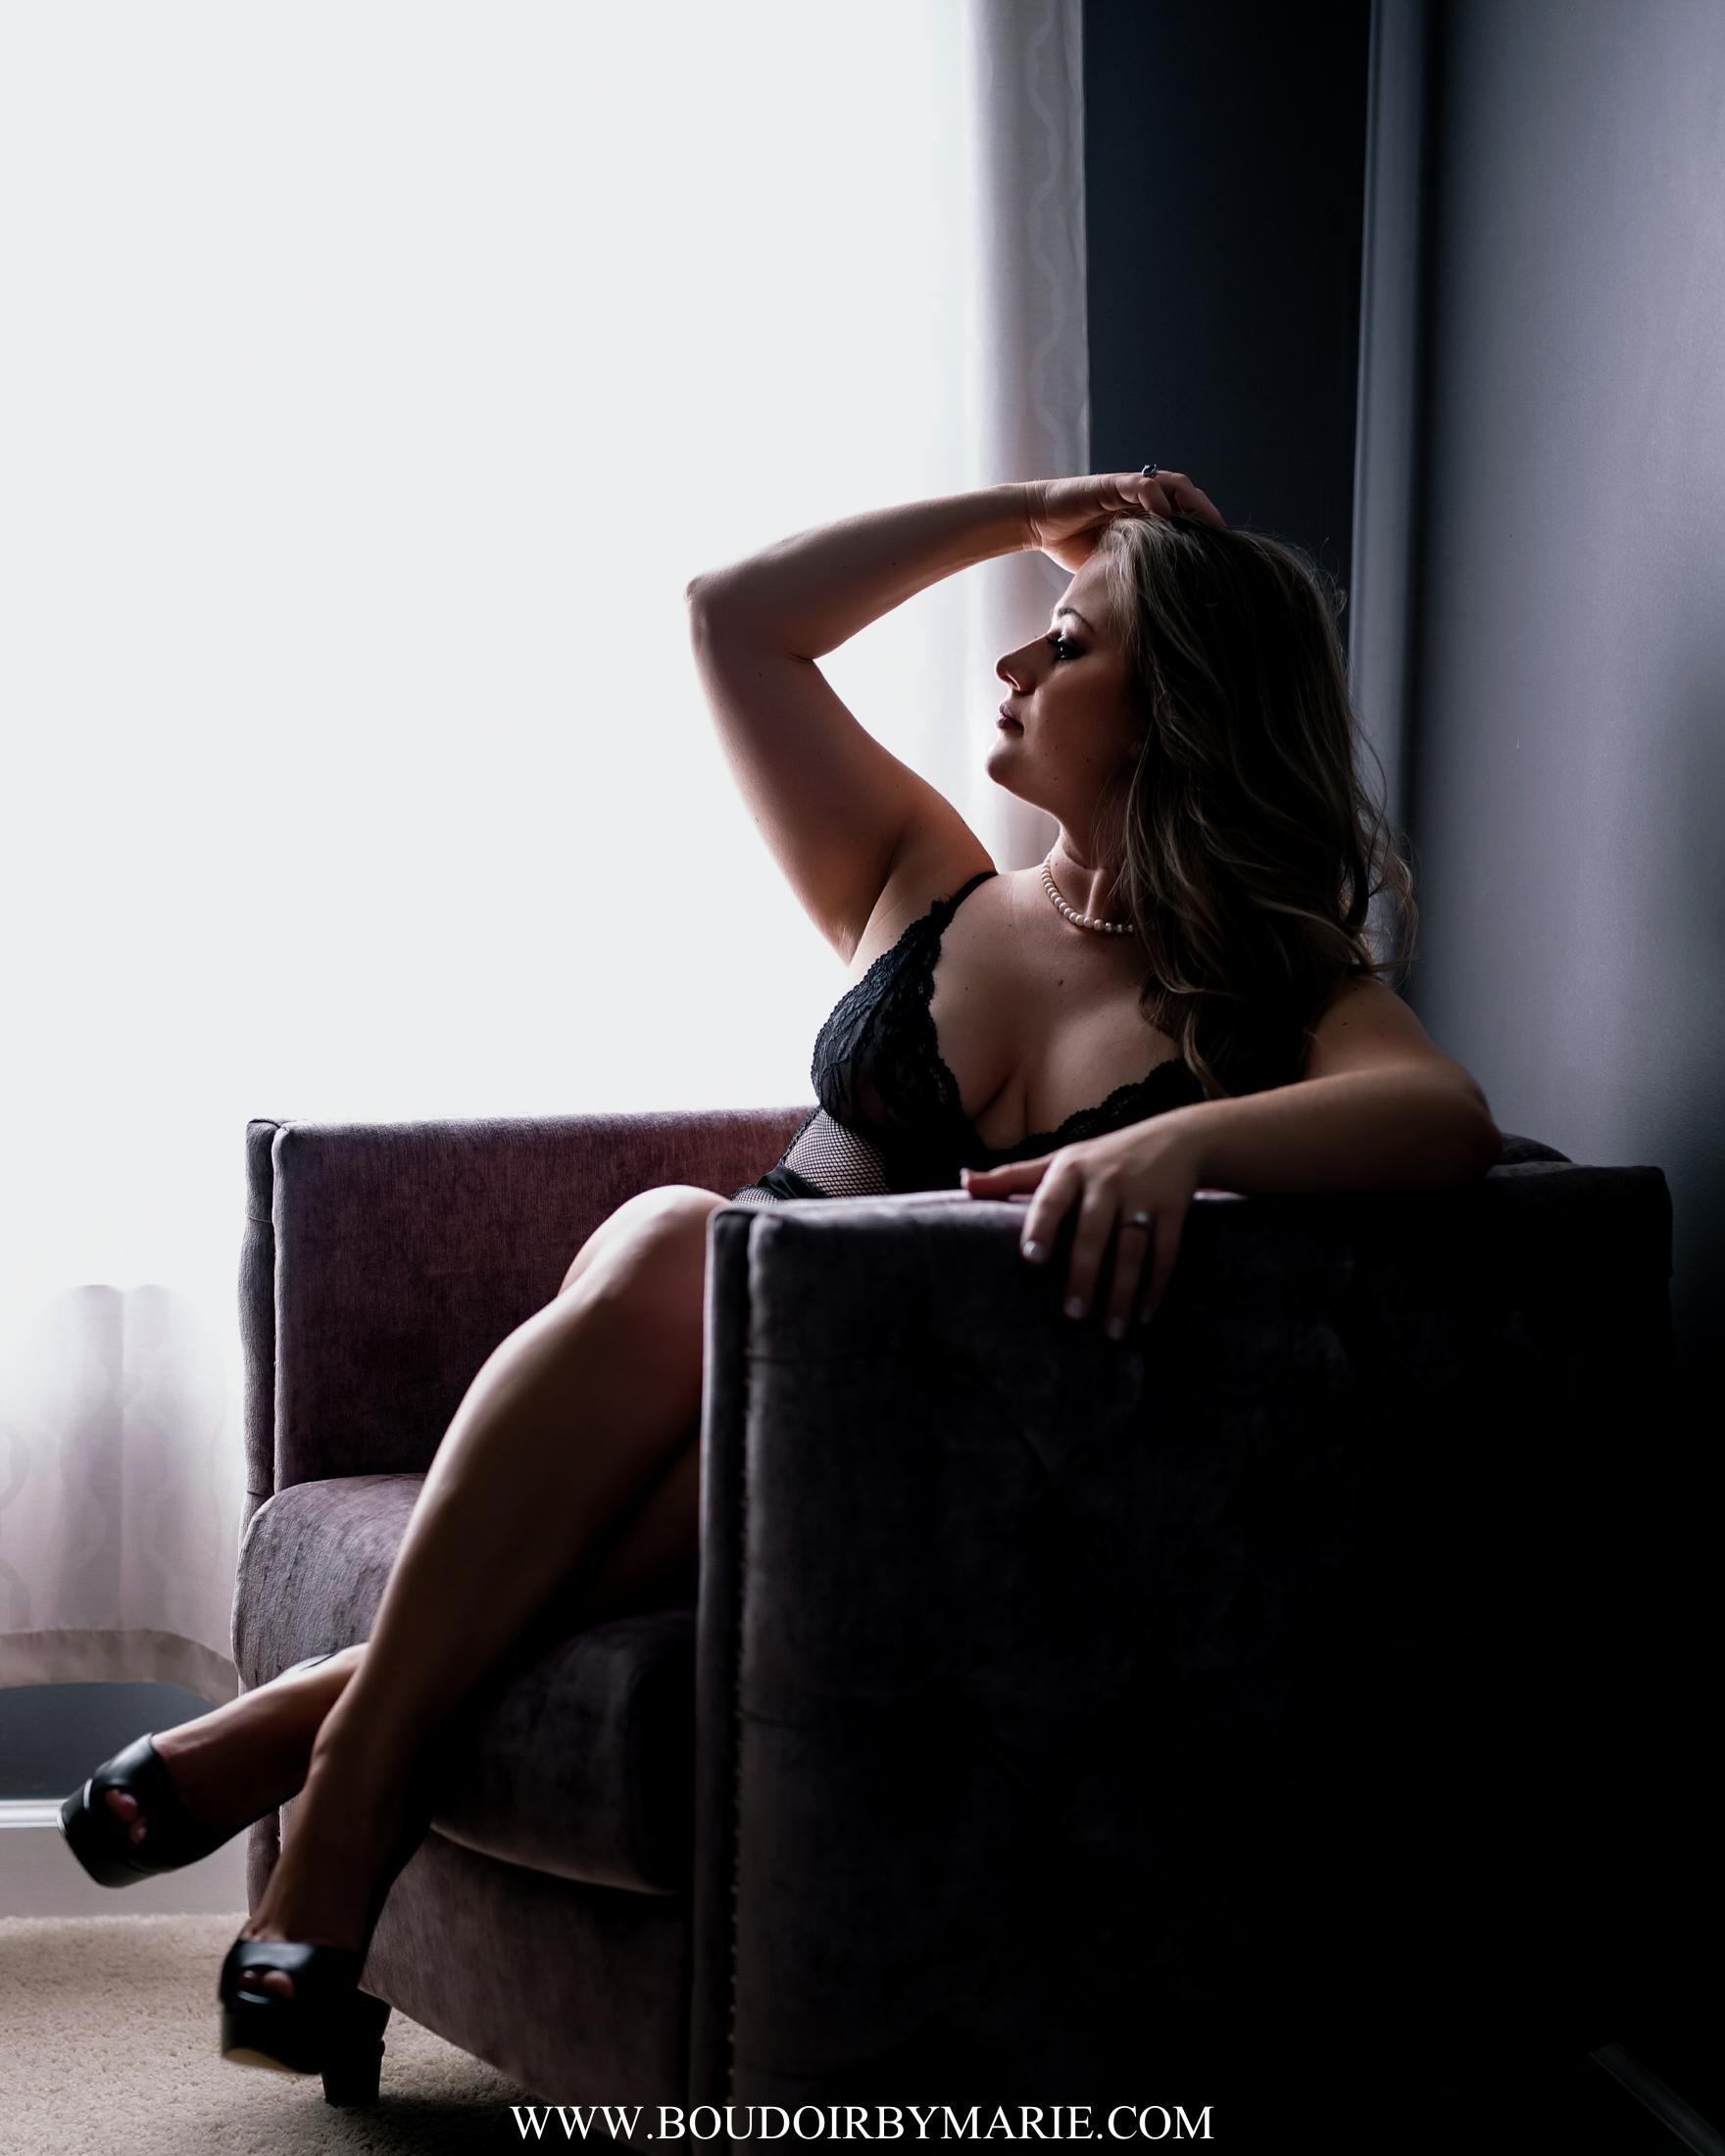 BoudoirbyMarie-Photography-12.jpg